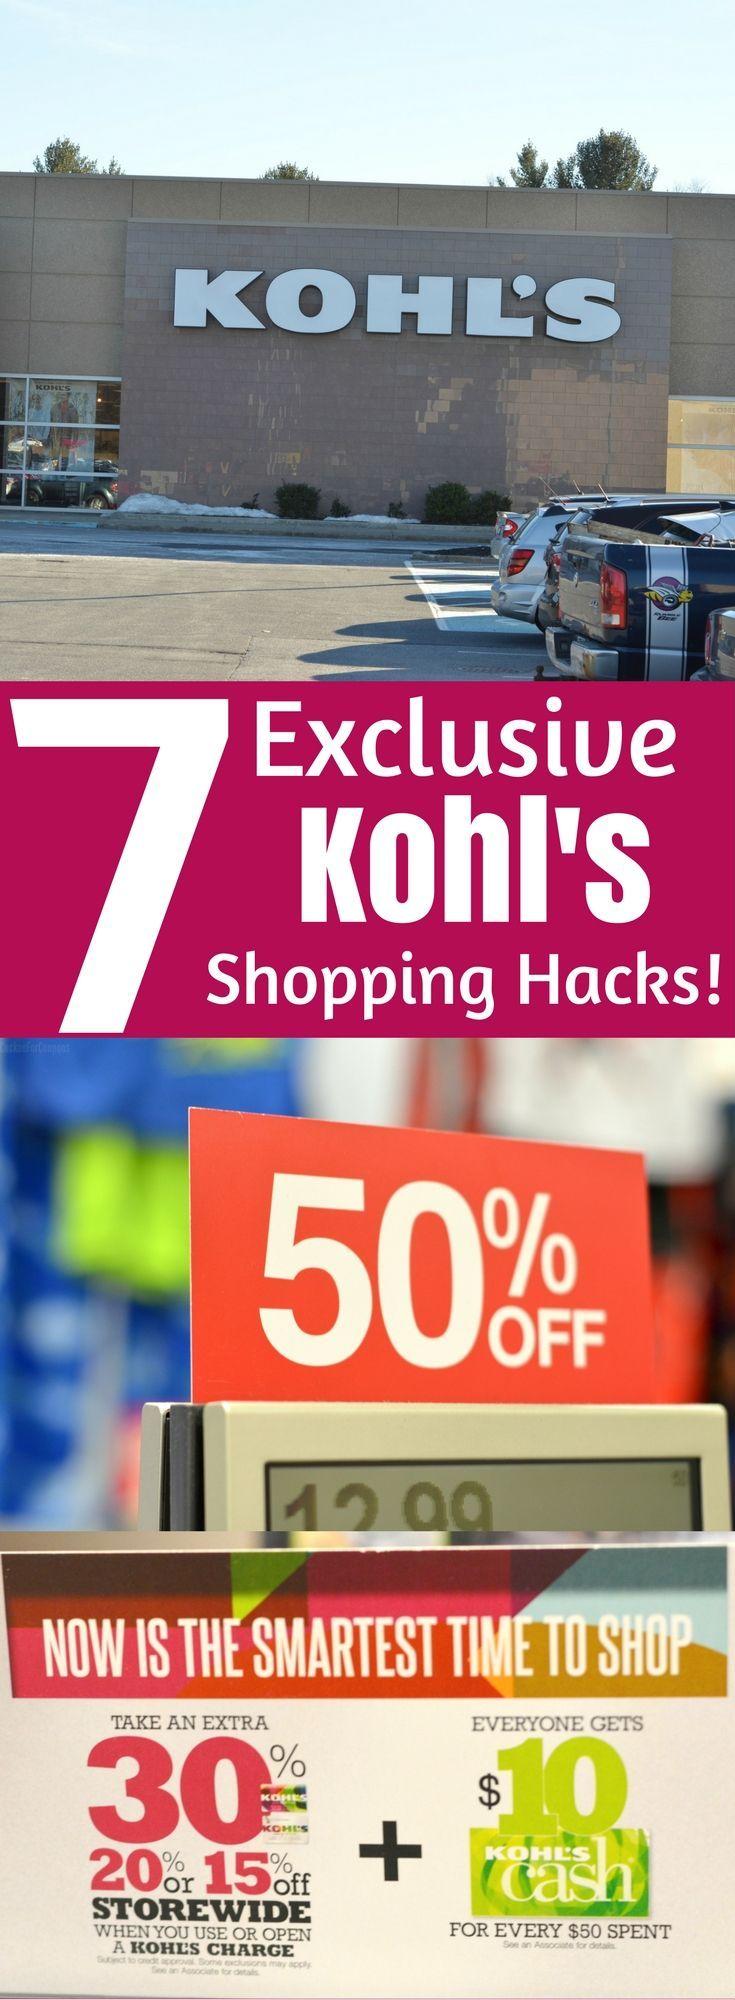 7 Exclusive Kohl's Shopping Hacks!